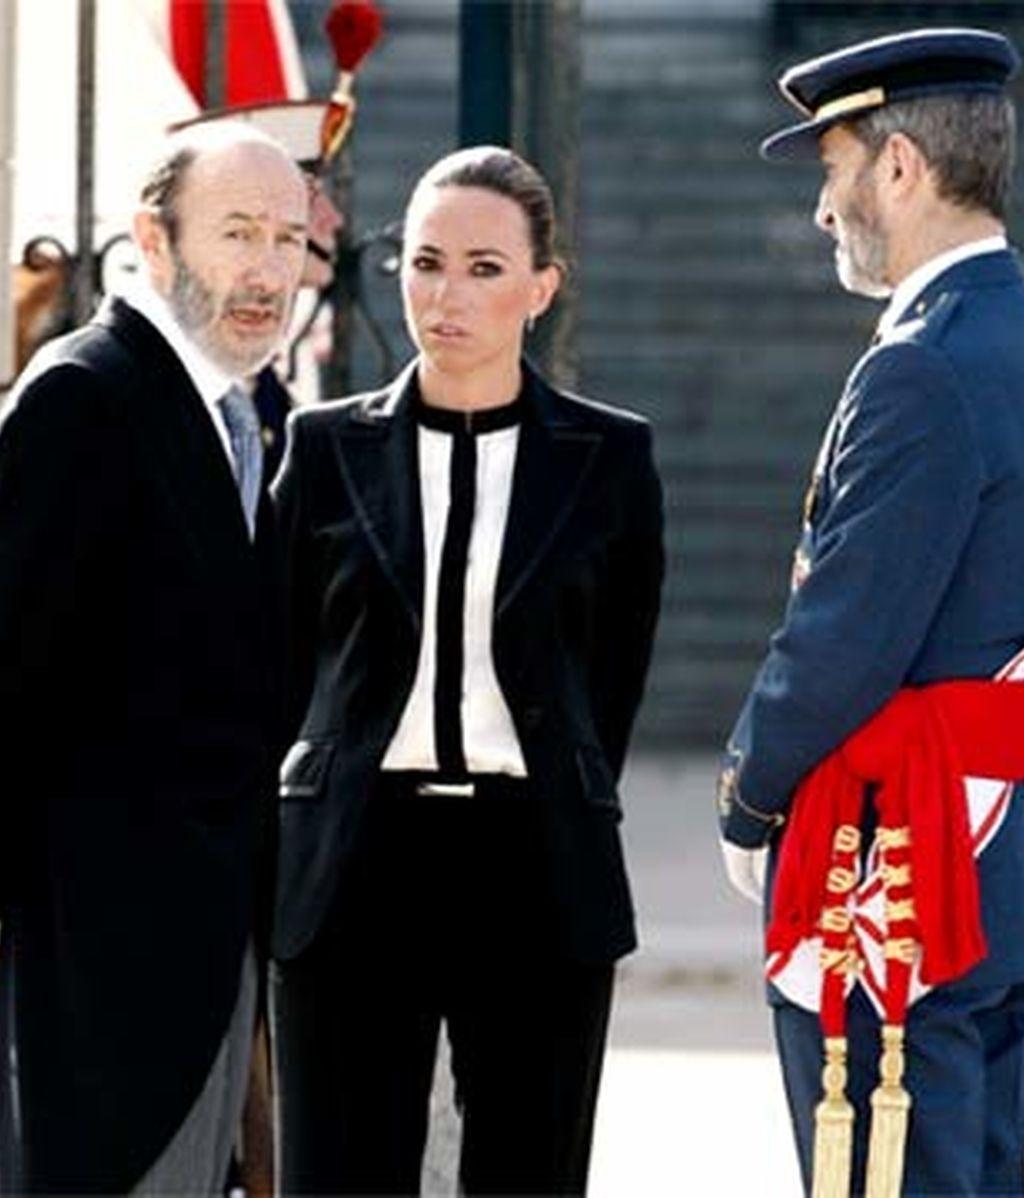 La ministra de Defensa, Carme Chacón, junto al ministro de Interior, Alfredo Pérez Rubalcaba. Foto: EFE